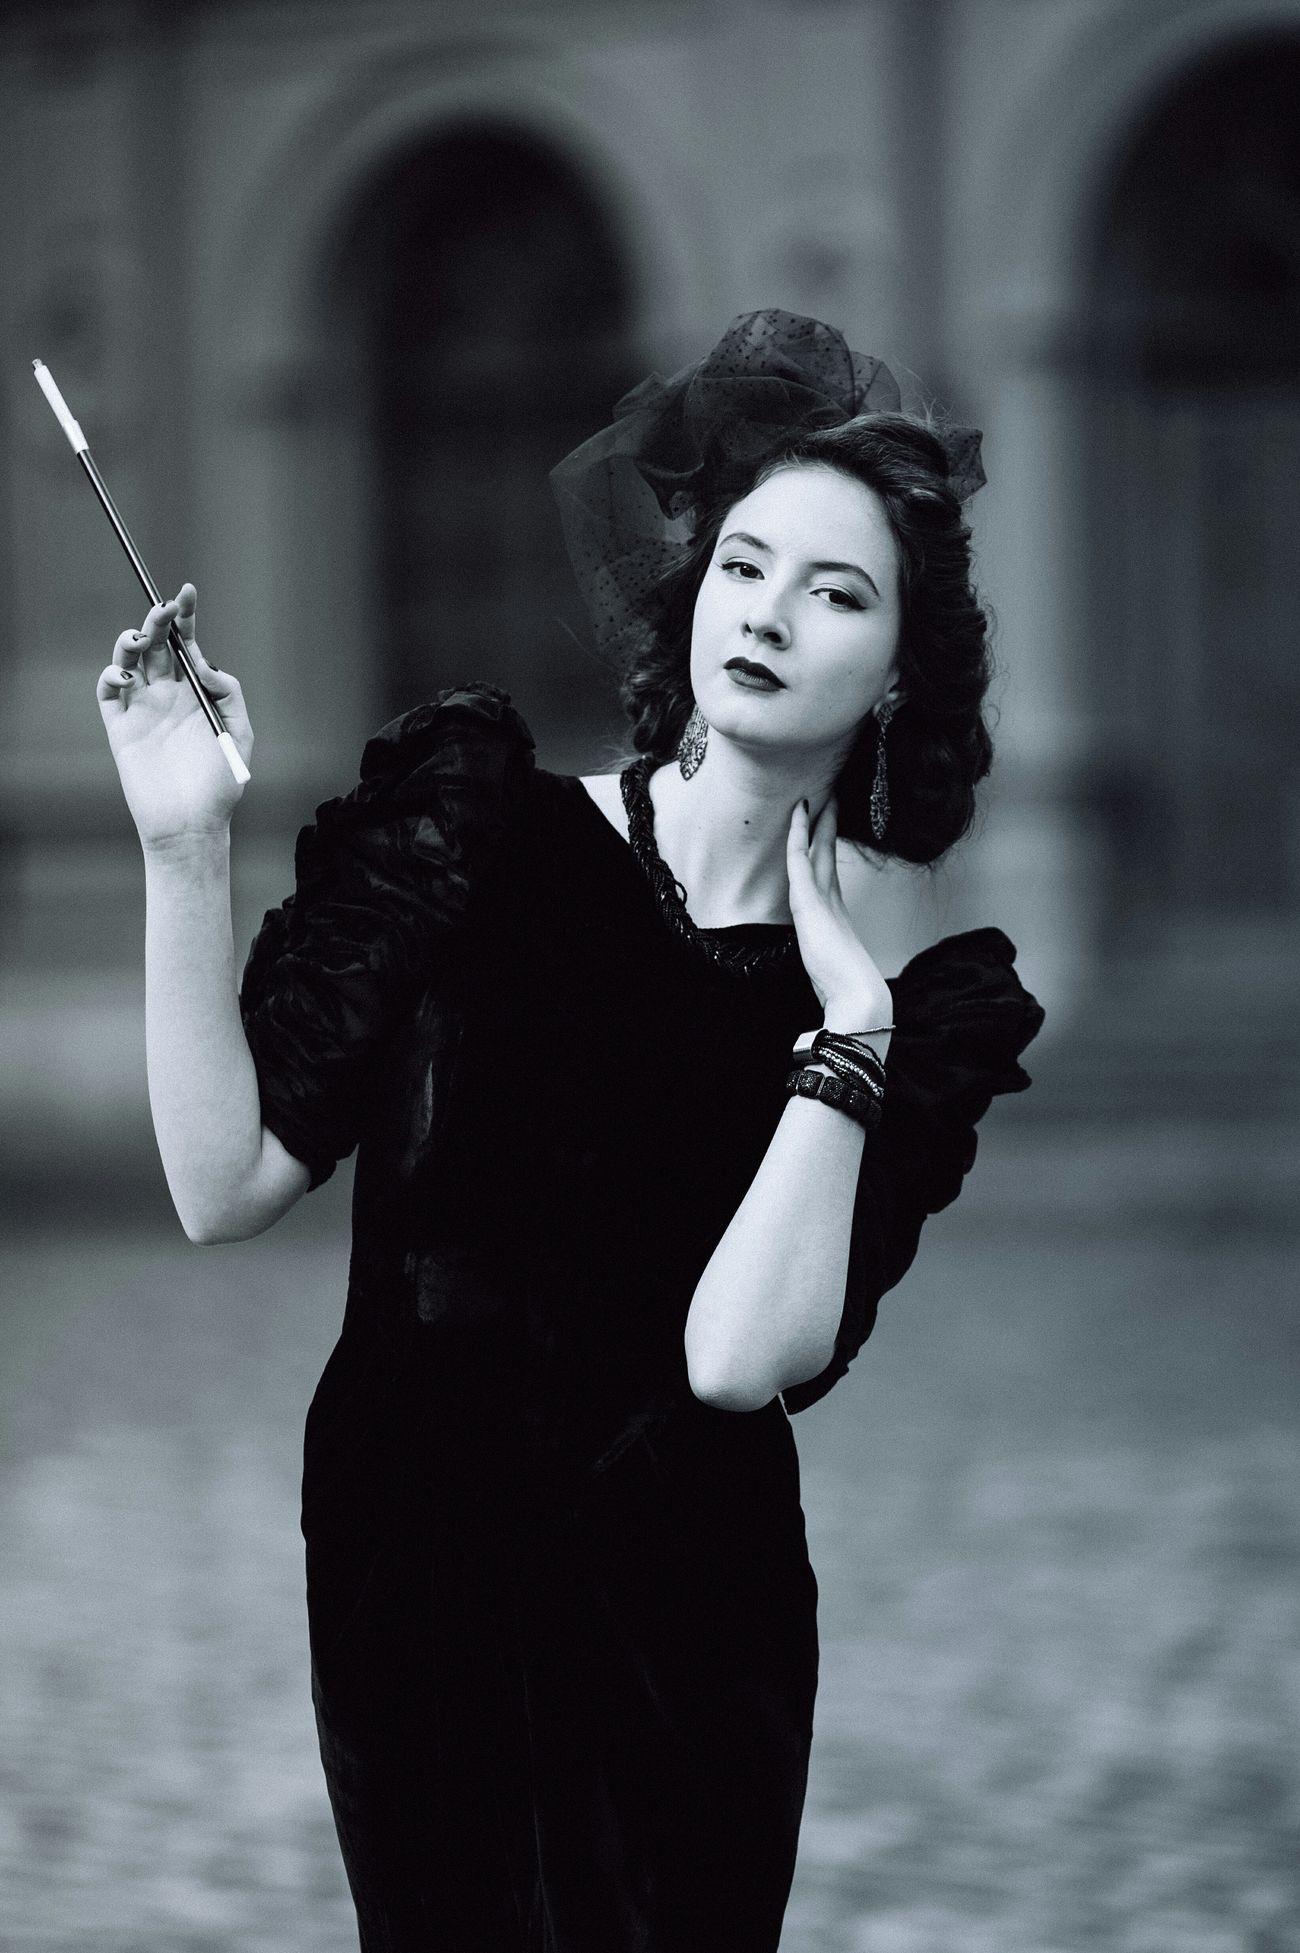 PhotoIF Blackandwhite Noir Girl Monochrome Portrait